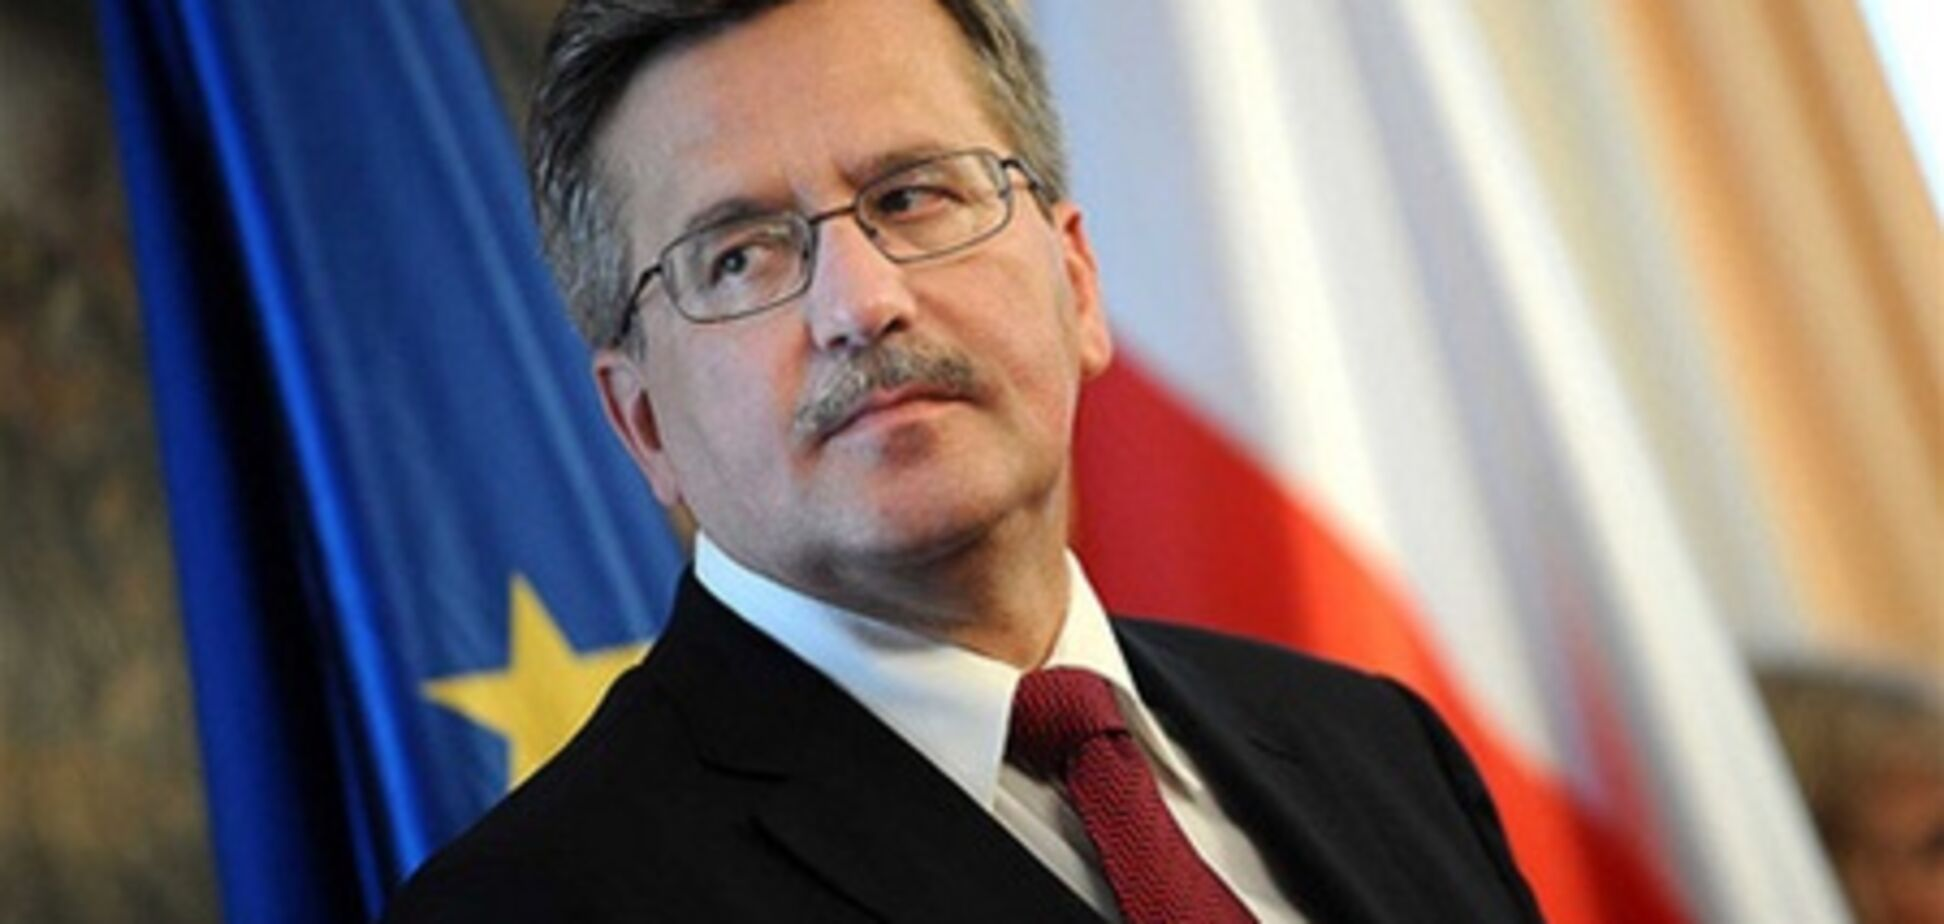 Президент Польши посмотрел на дело Тимошенко глазами Януковича